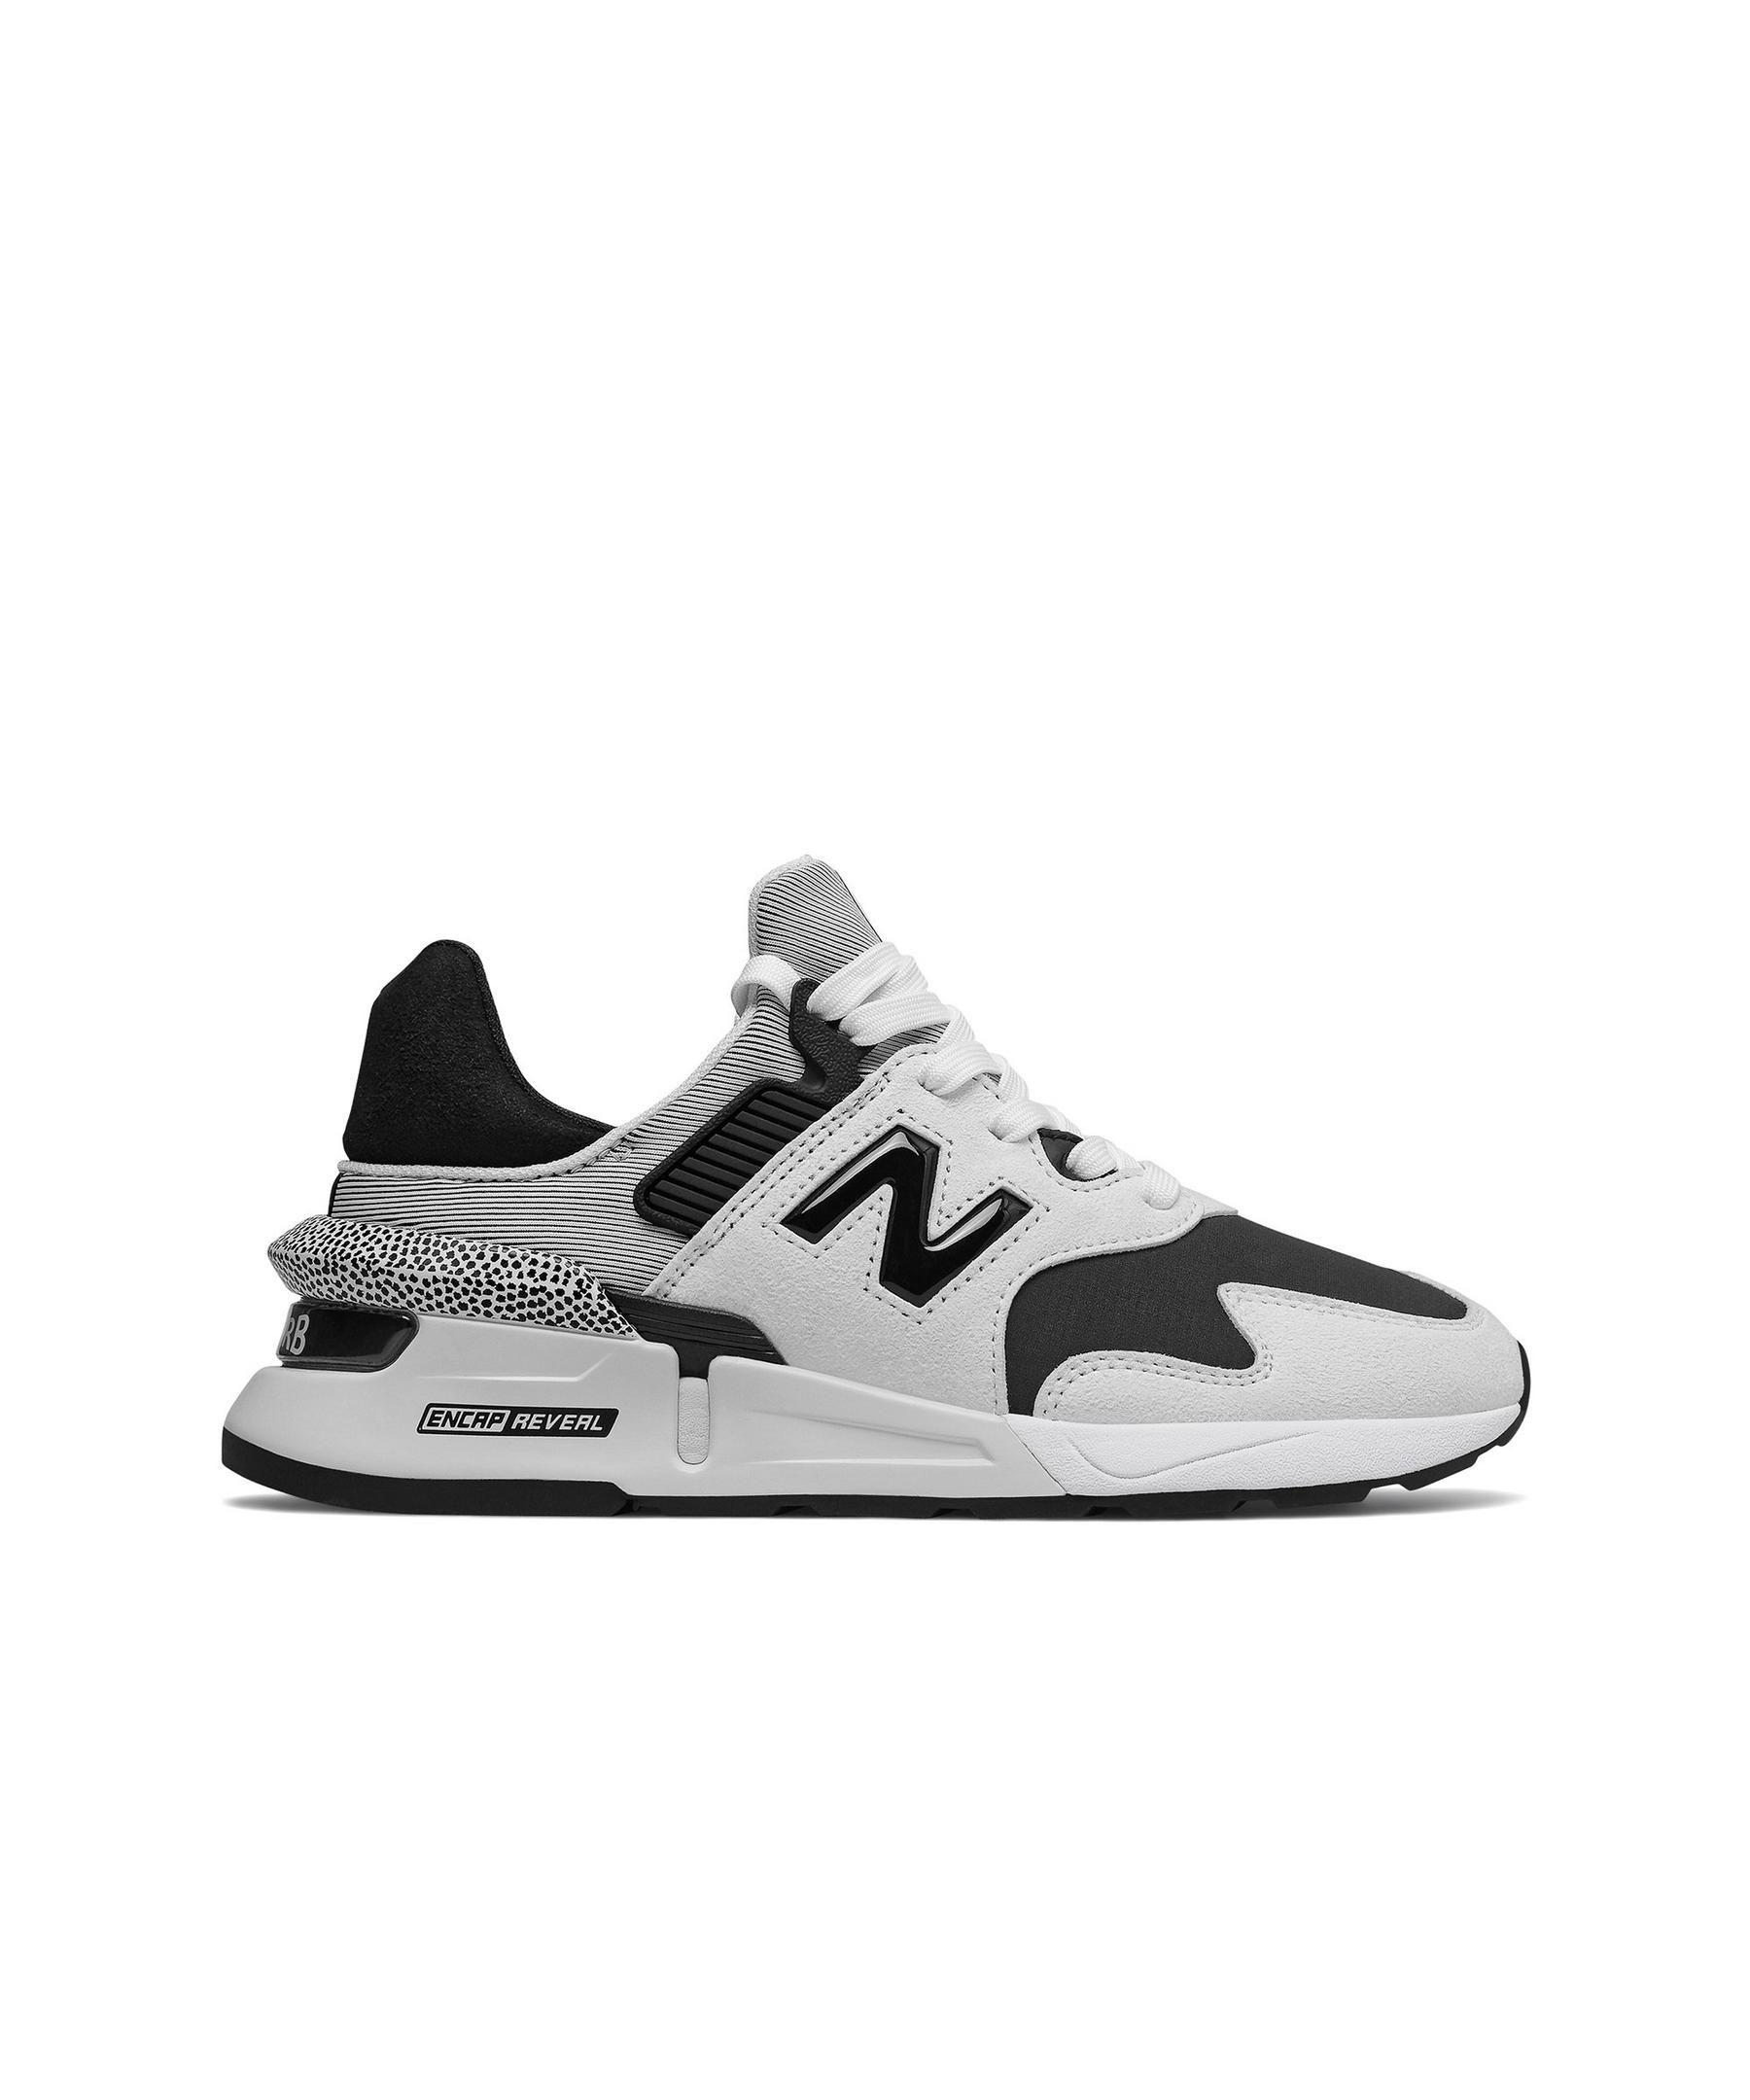 "New Balance 997 Sport ""White/Black"" Women's Shoe Hibbett"